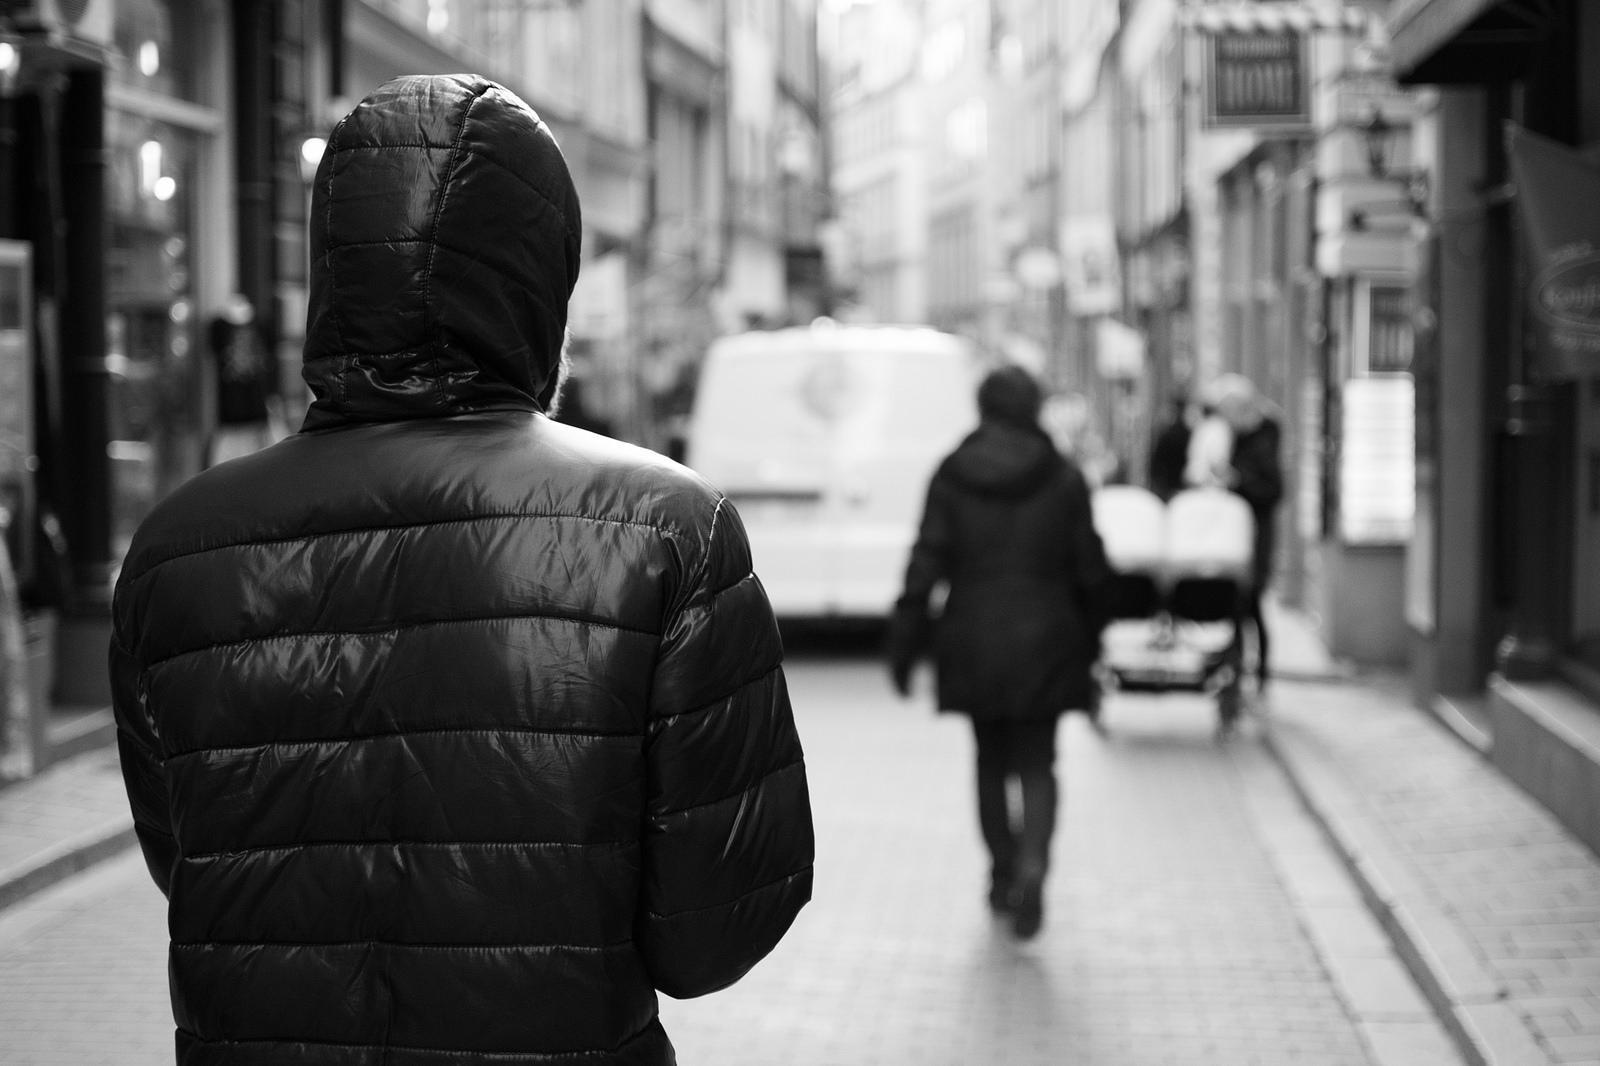 (Photo: Patrik Nygren/Flickr)